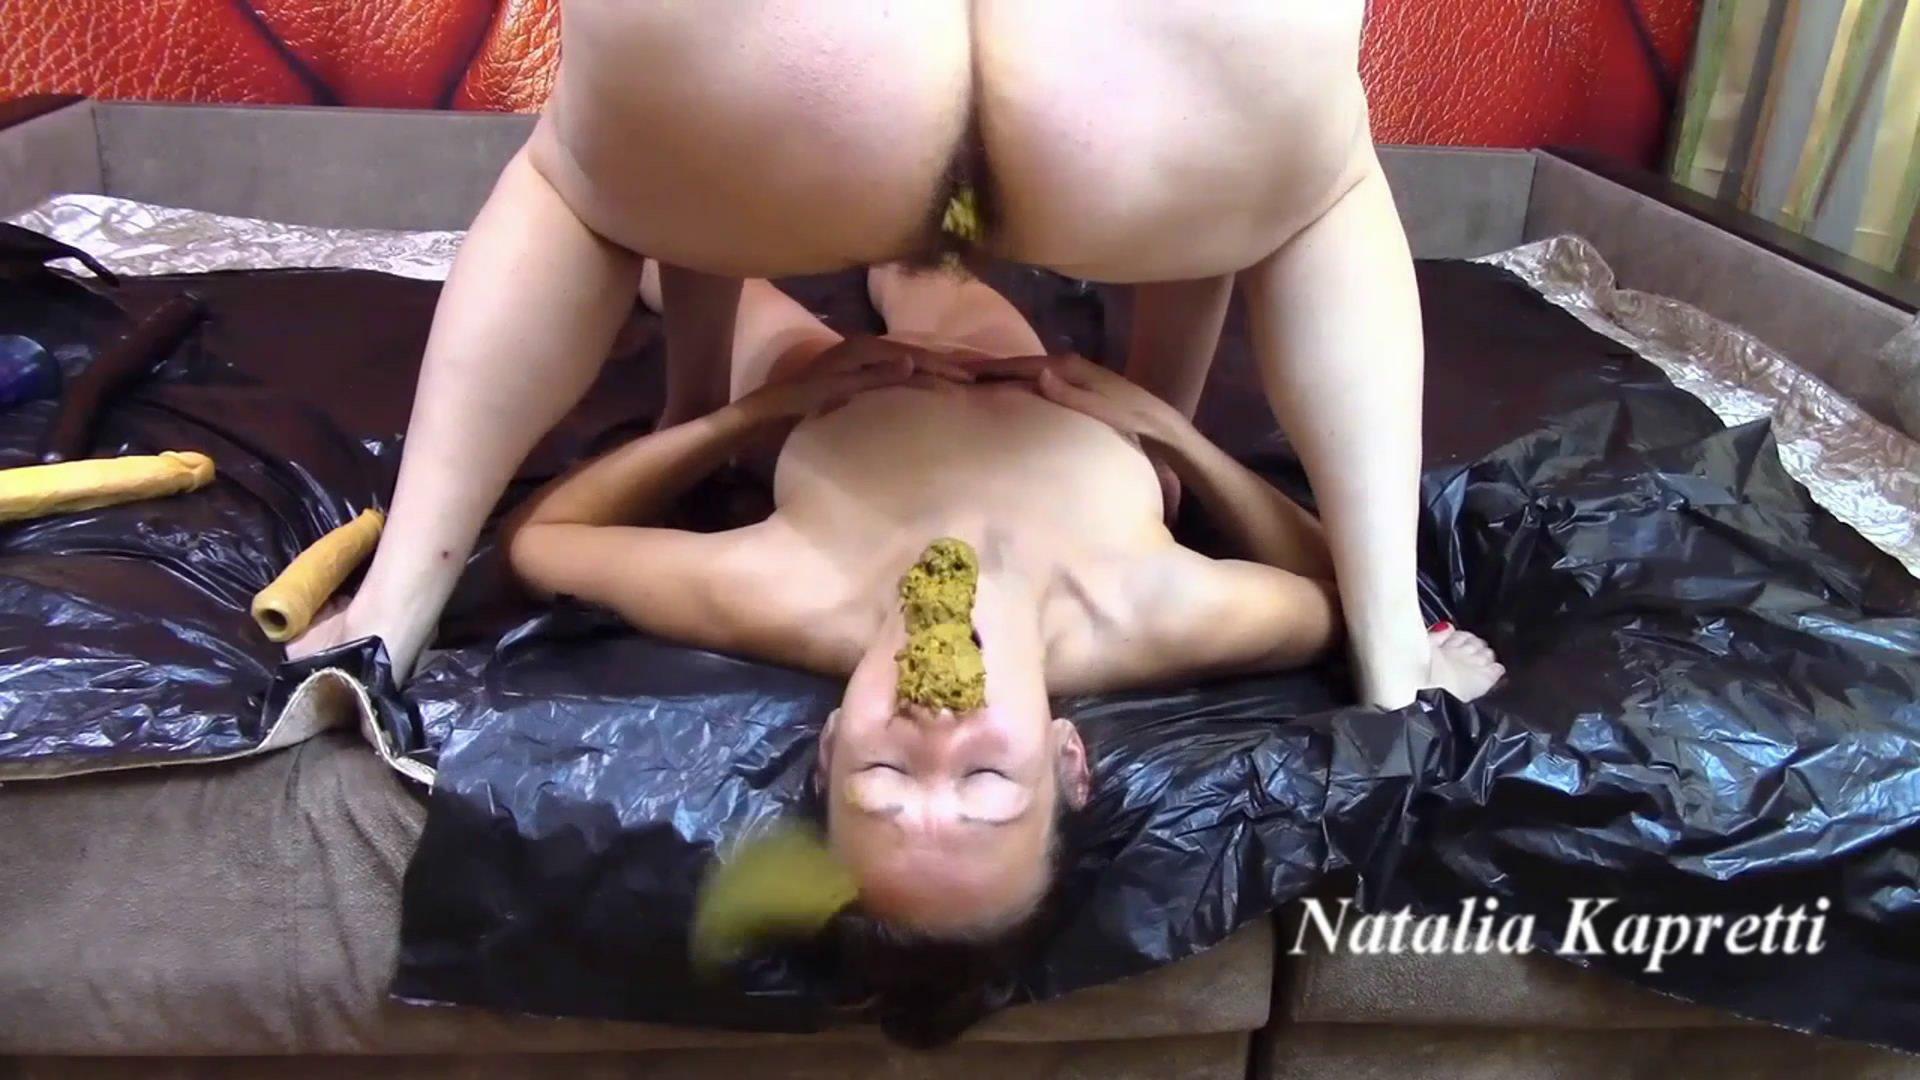 Incredible dirty scat sex with toilet slavegirl starring in video Mistress/Natalia Kapretti ($39.99 ScatShop)